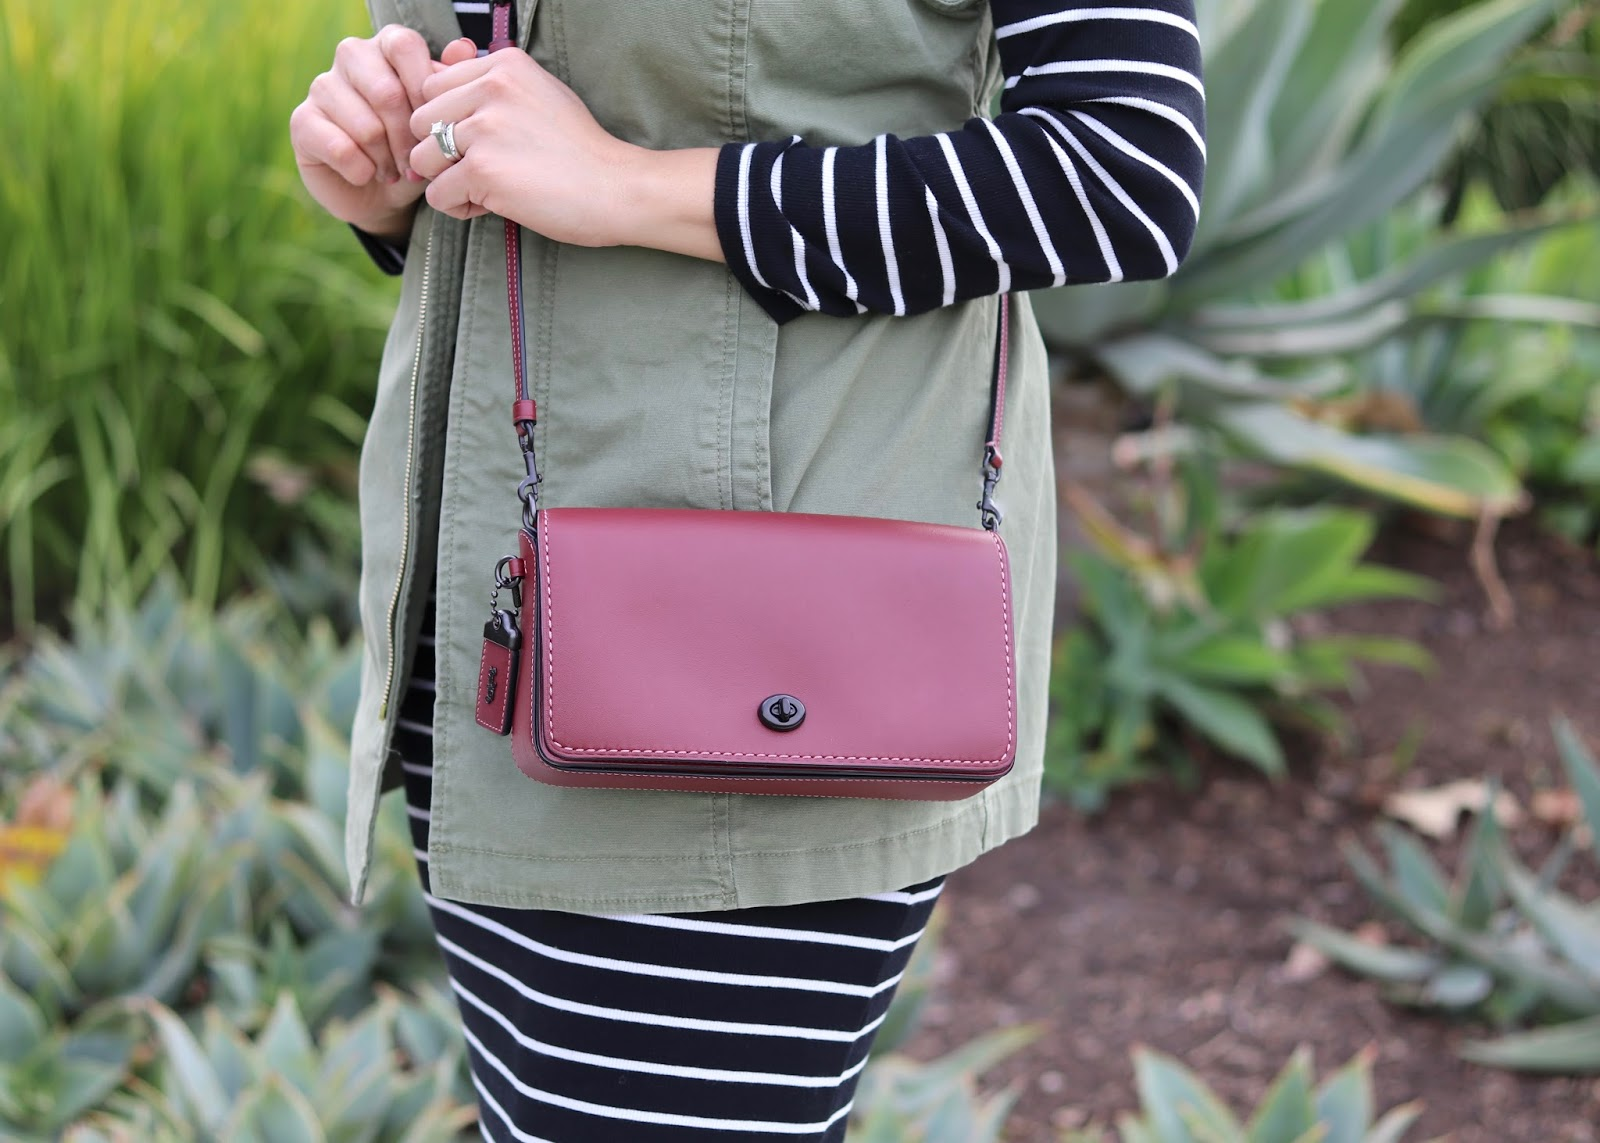 Coach Dinky Crossbody, burgundy purse, coach purse blogger